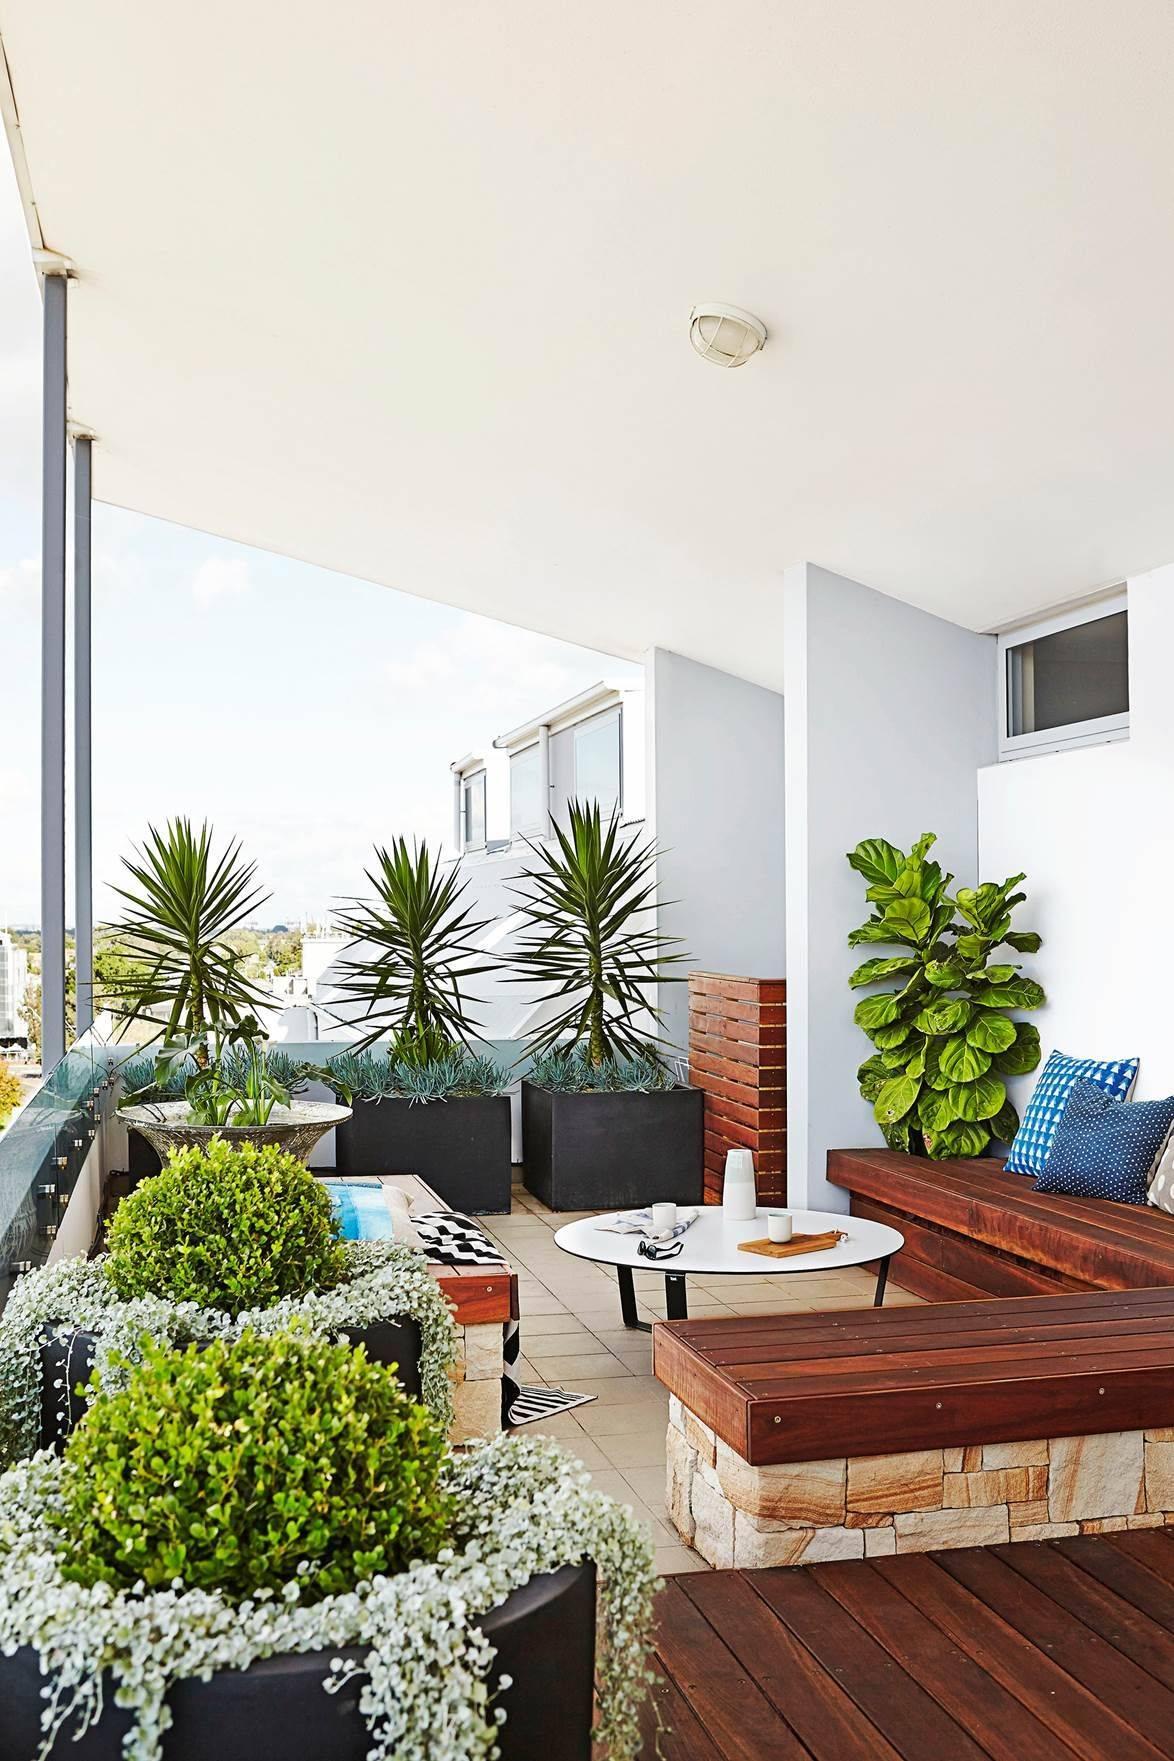 balcony plants design ideas fresh gallery the ultimate garden balcony of balcony plants design ideas